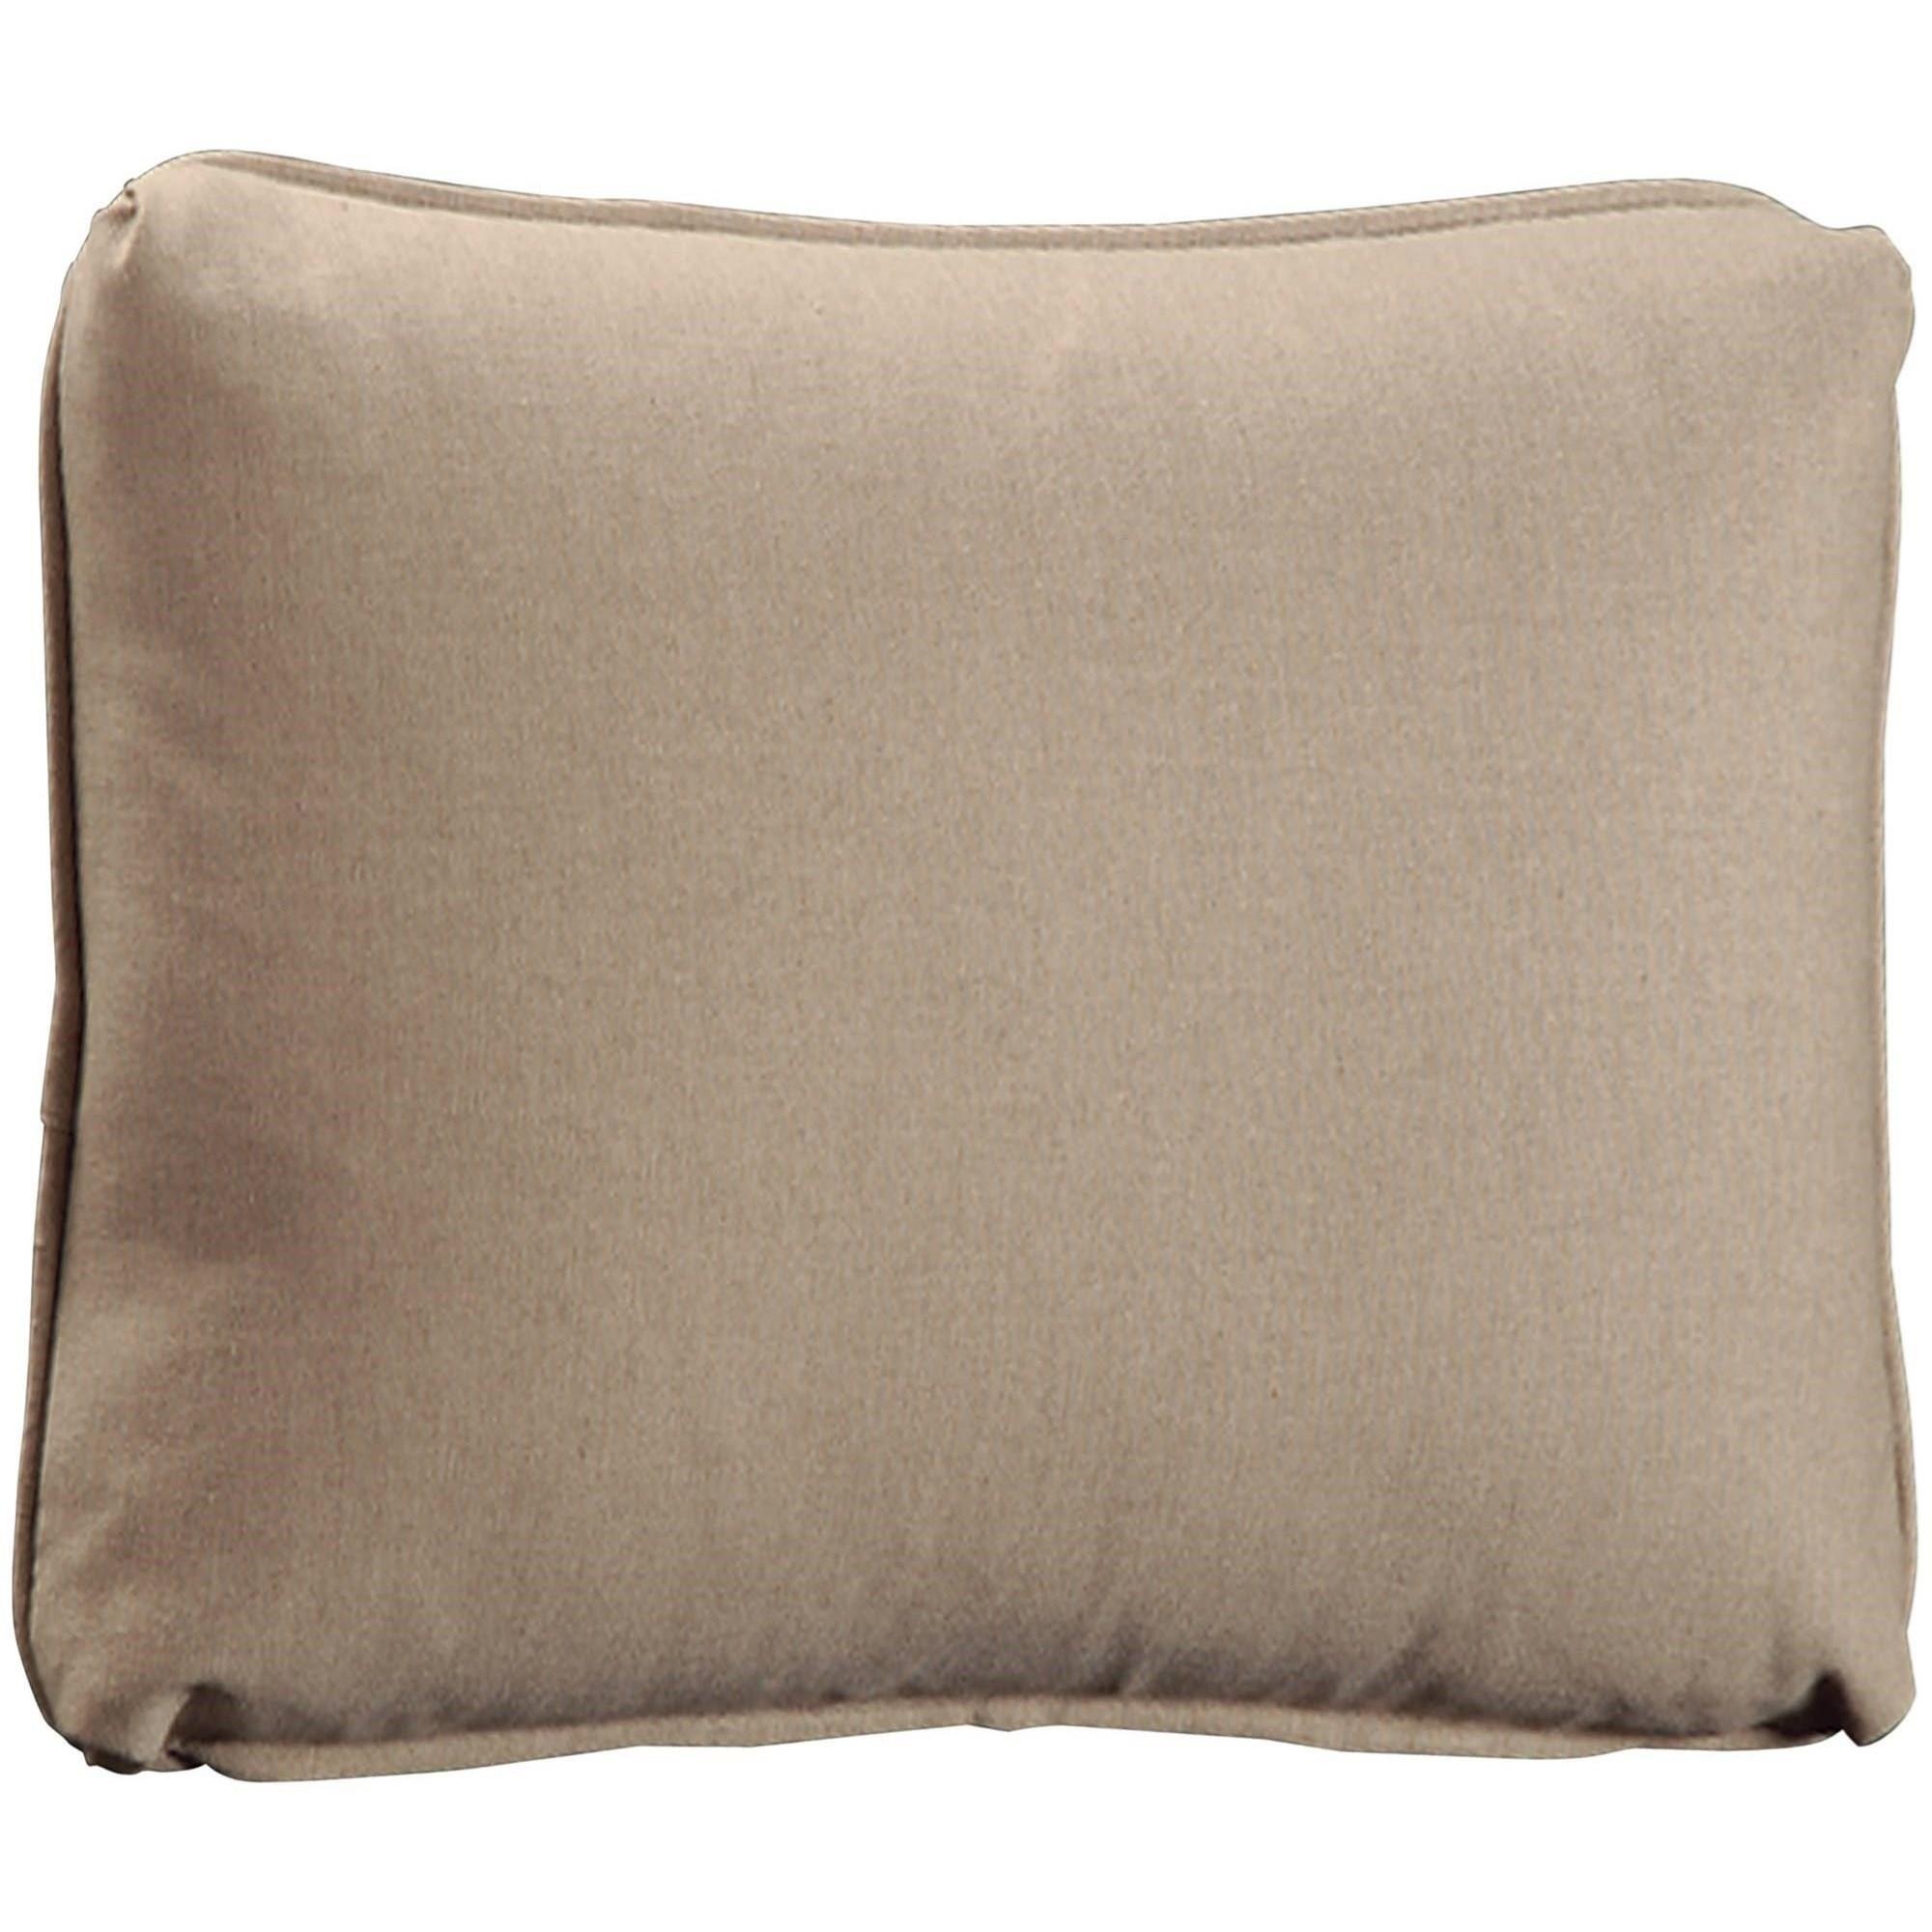 "Throw Pillows Knife Edge Kidney w/welt (16"" x 20"") at Williams & Kay"